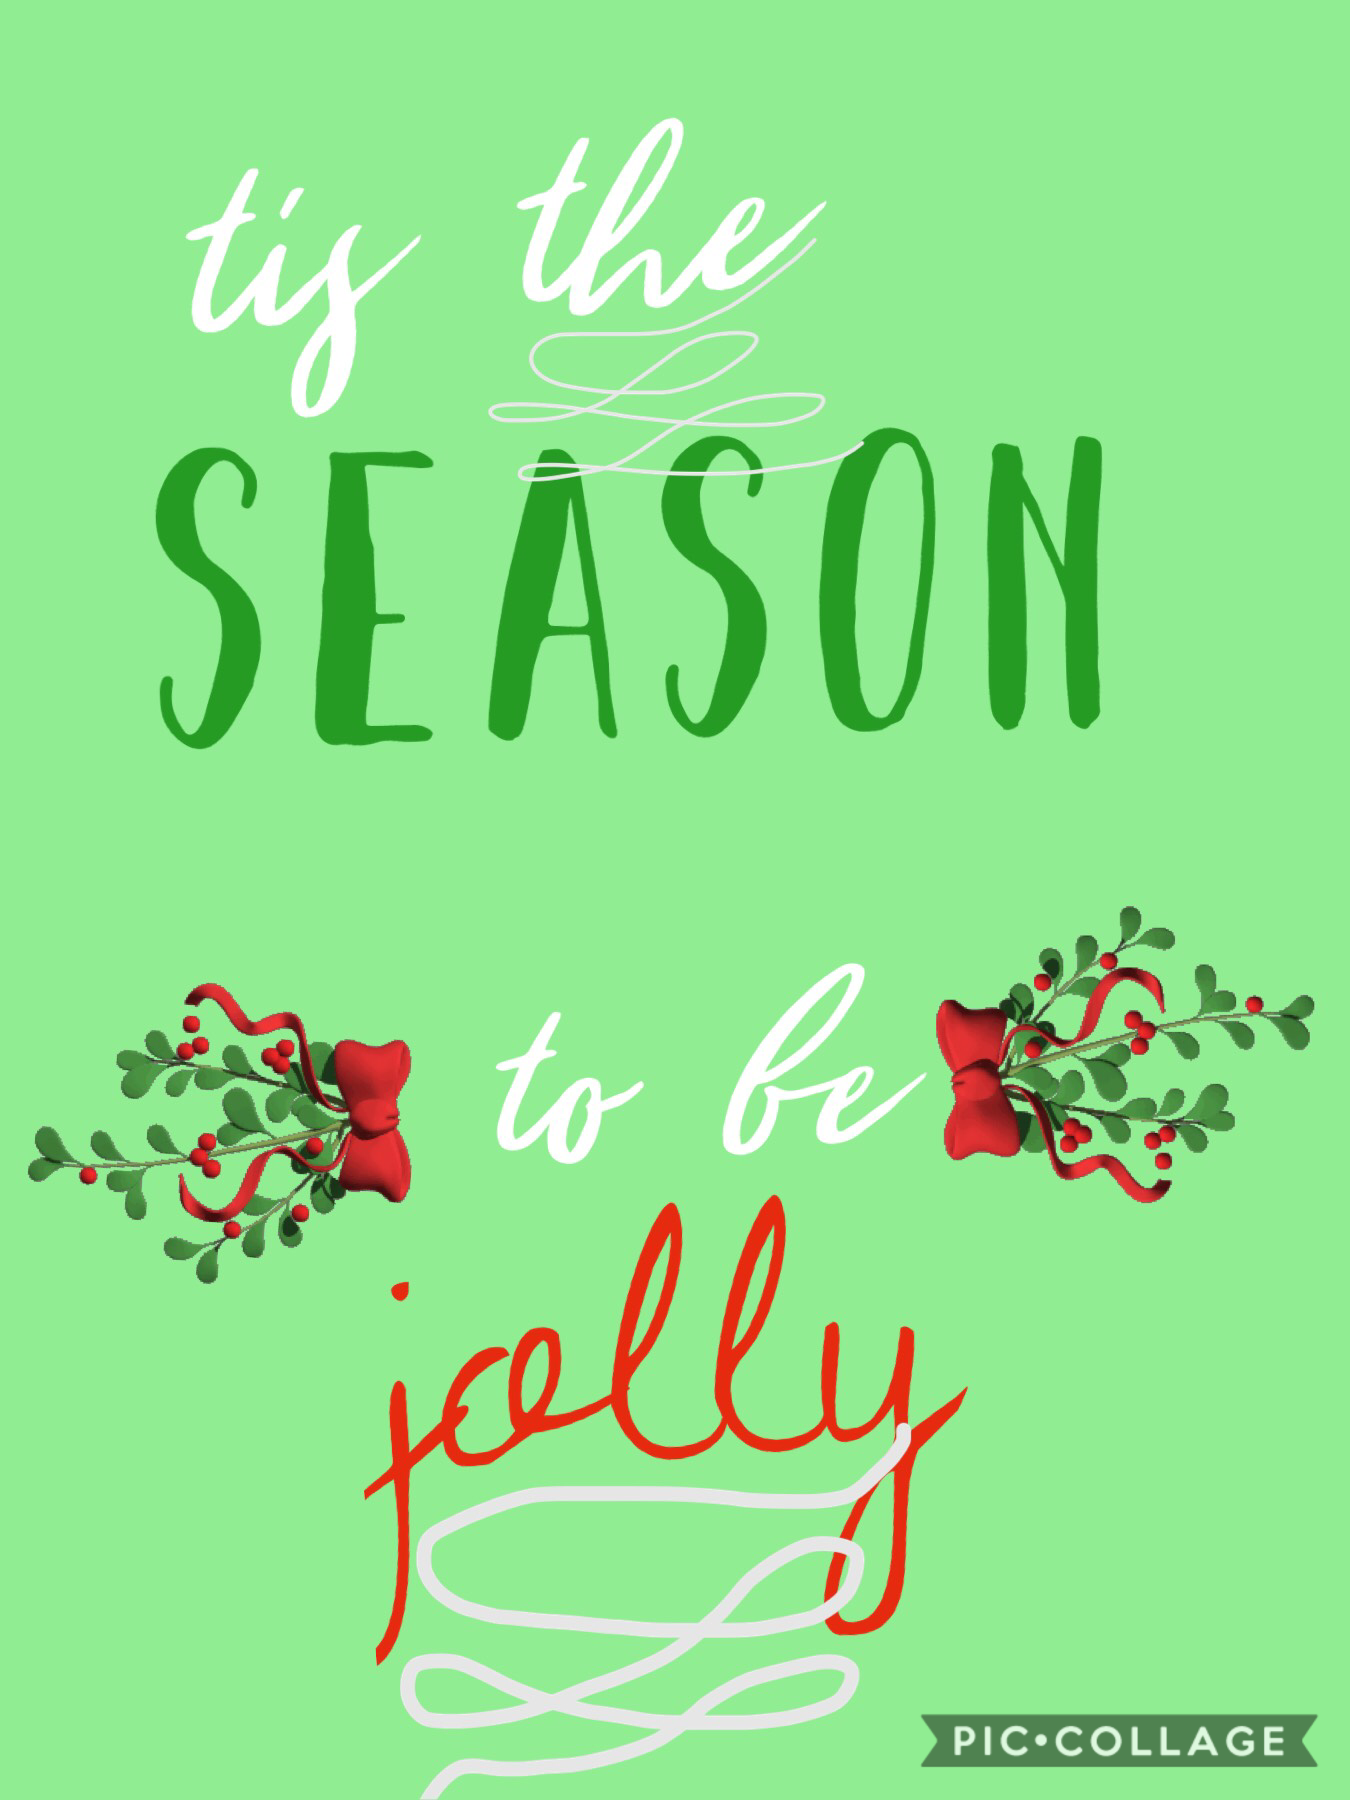 2 Days Till Christmas!!!